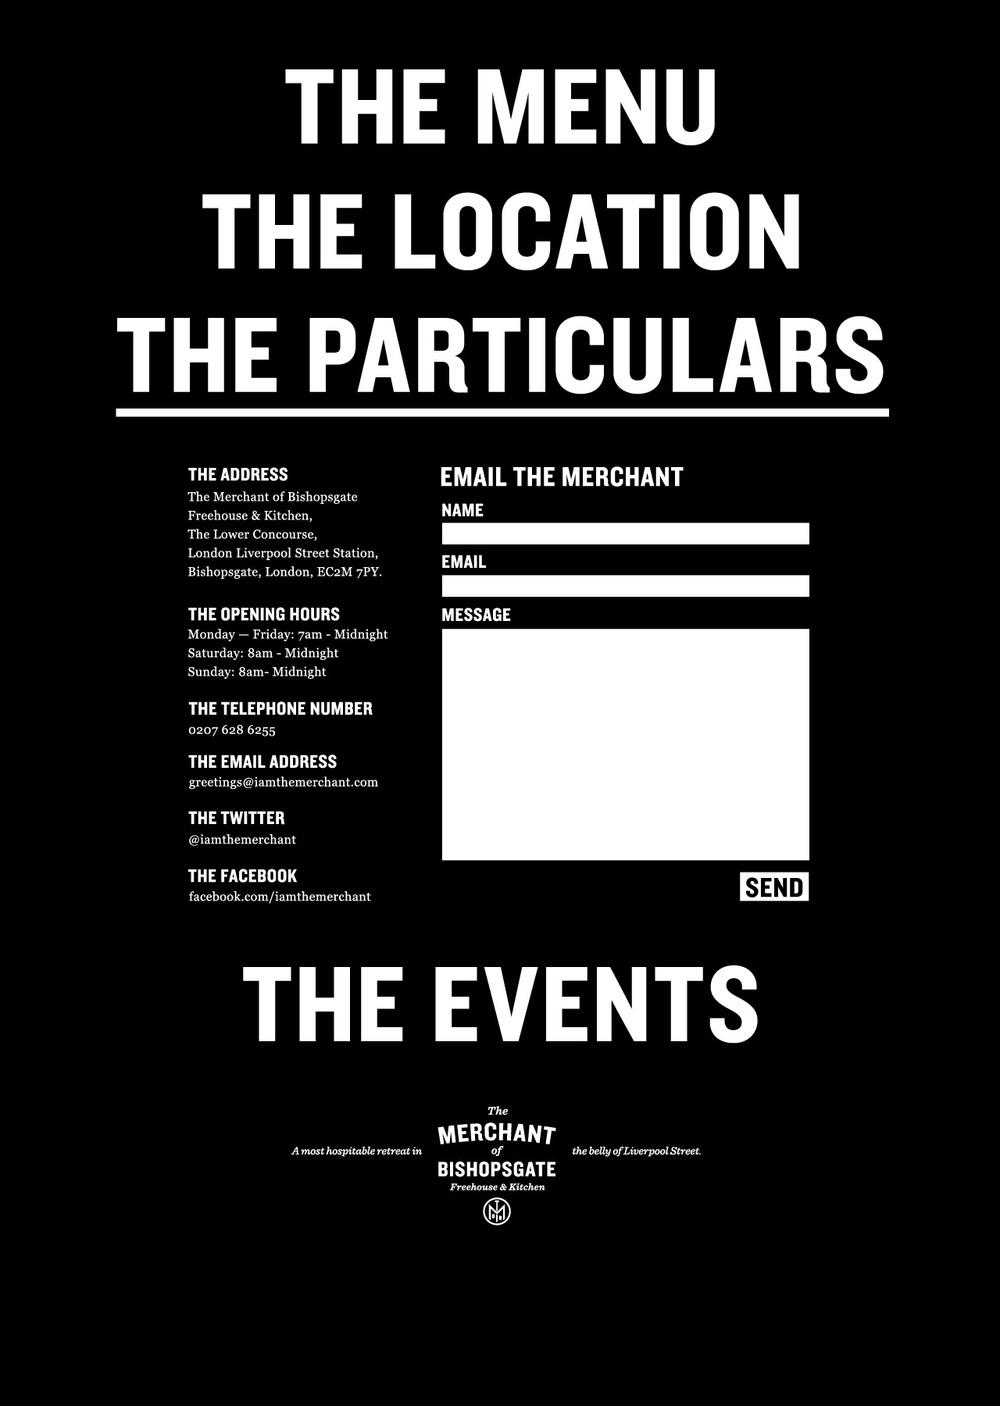 TM_WEB_0003_THE PARTICULARS.jpg